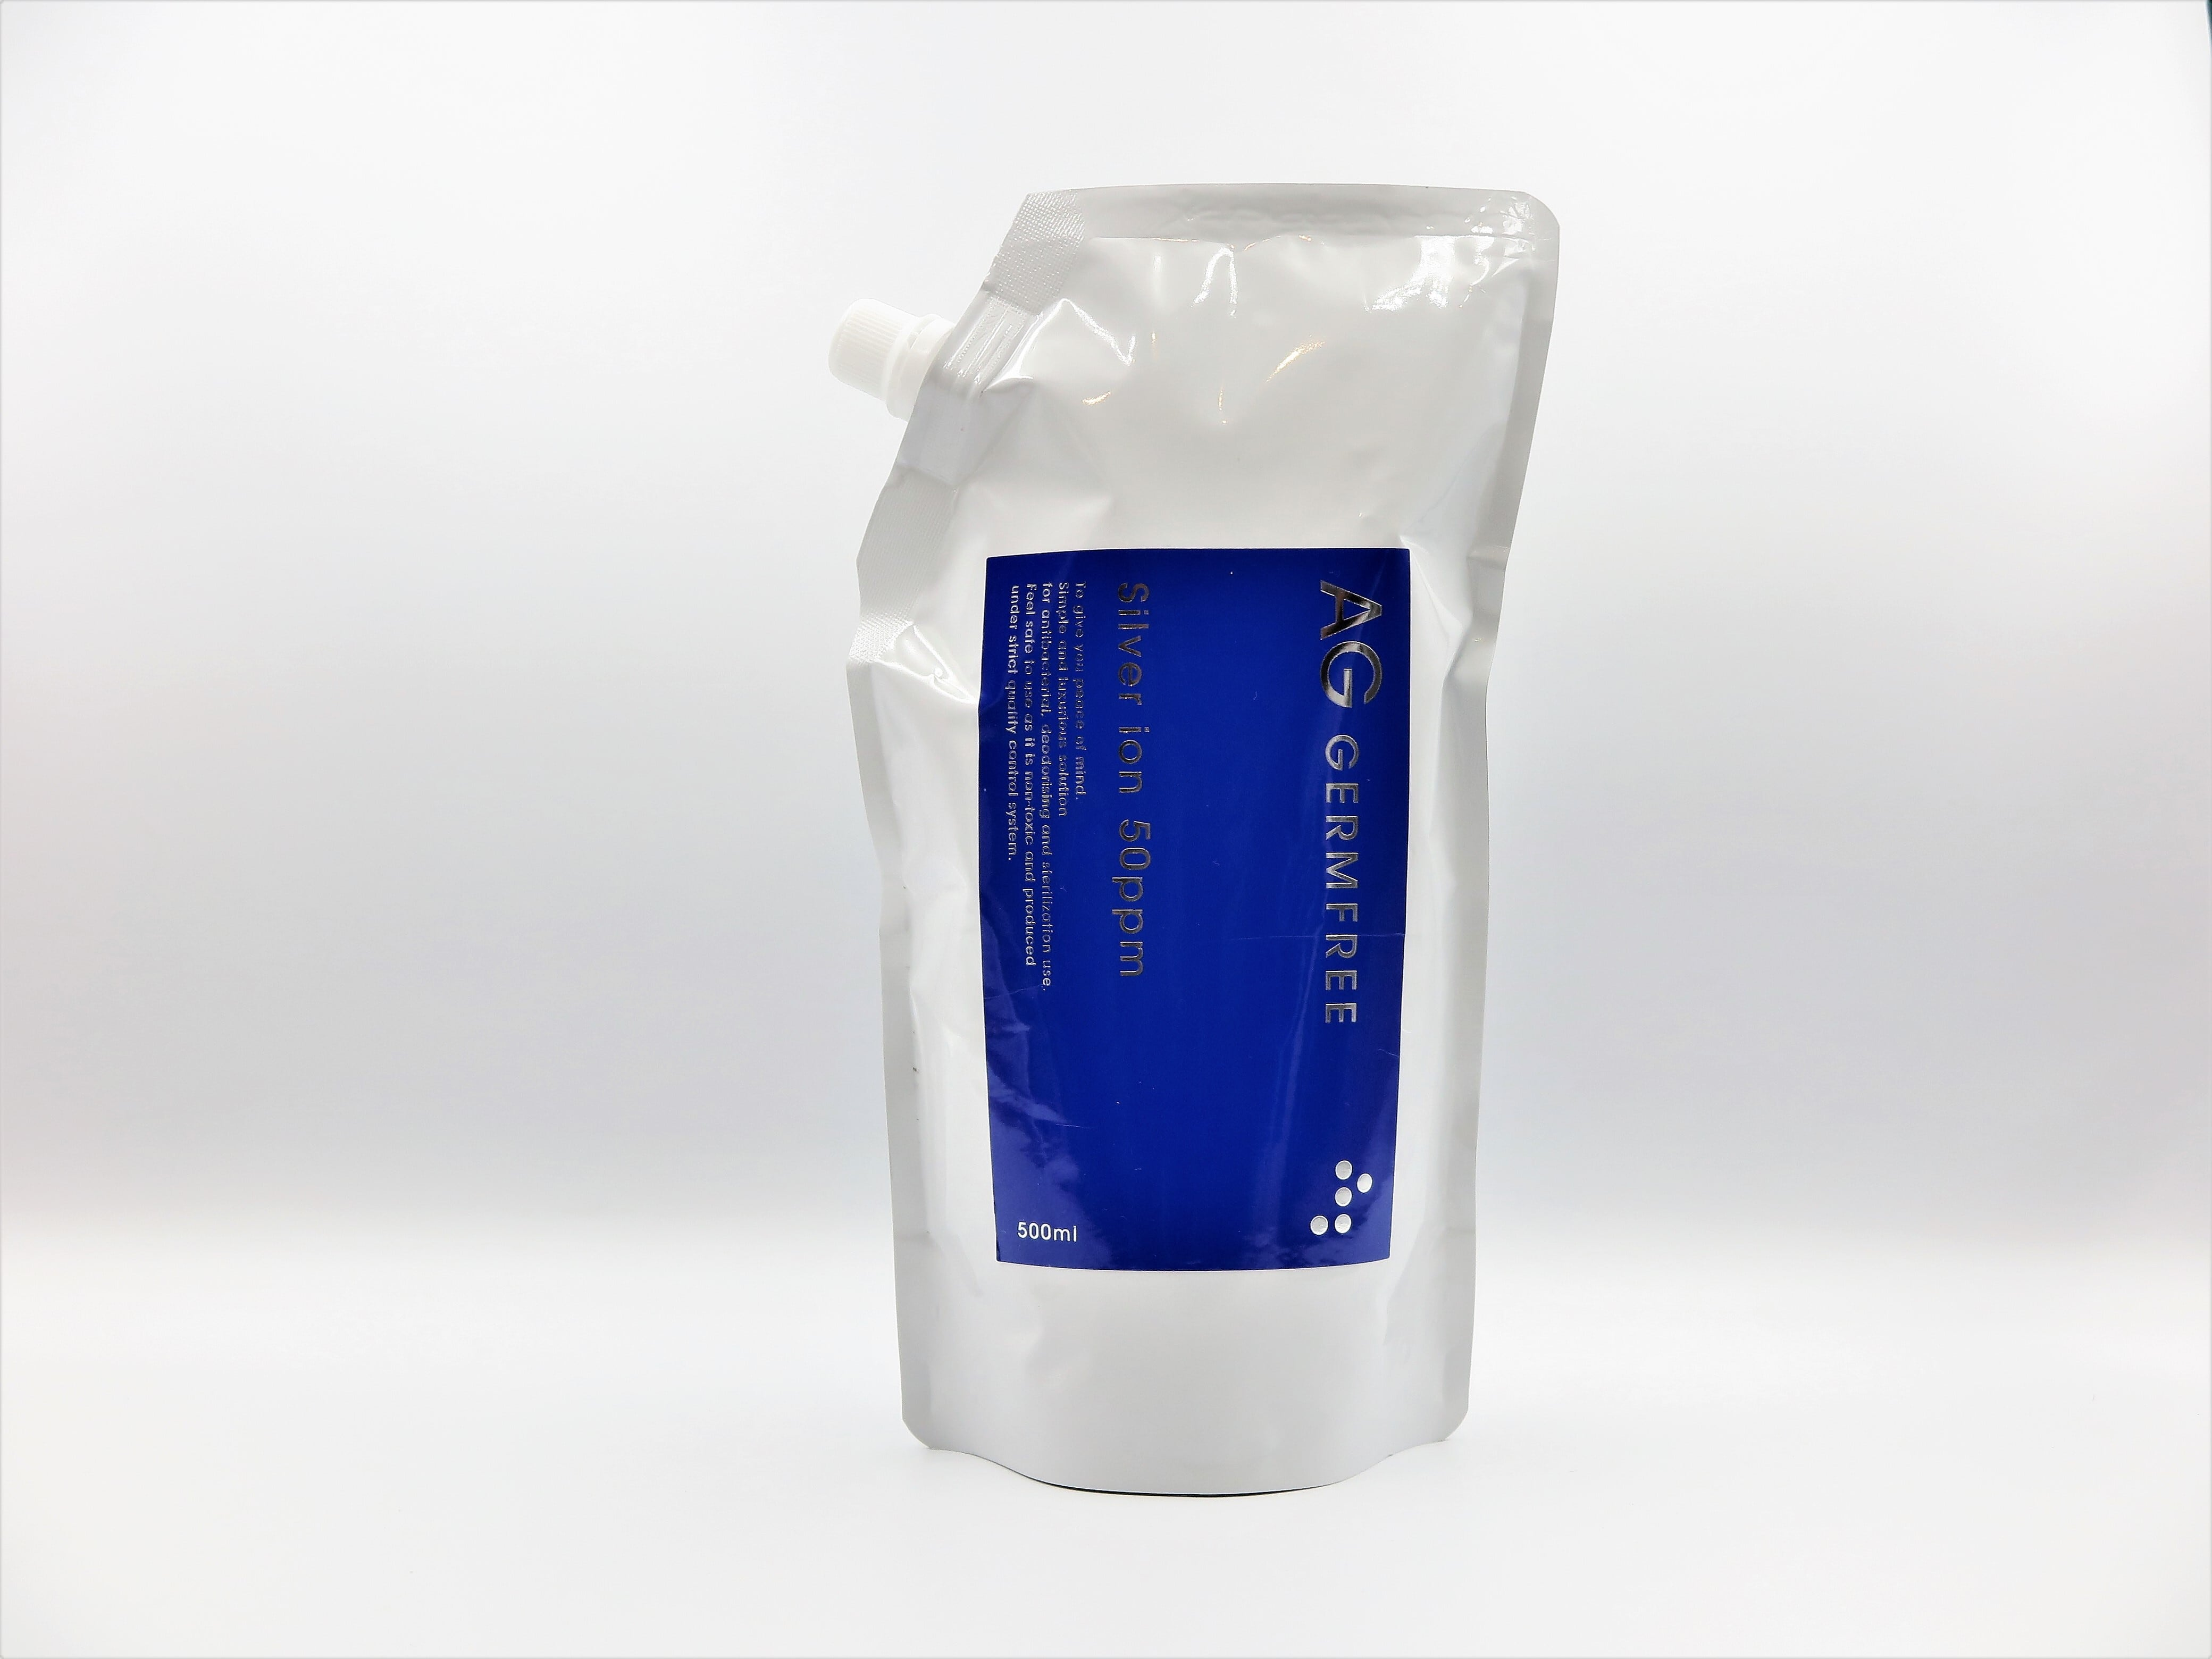 AG GERMFREE 500ml 高濃度銀イオン水(50ppm)除菌・抗菌・消臭に